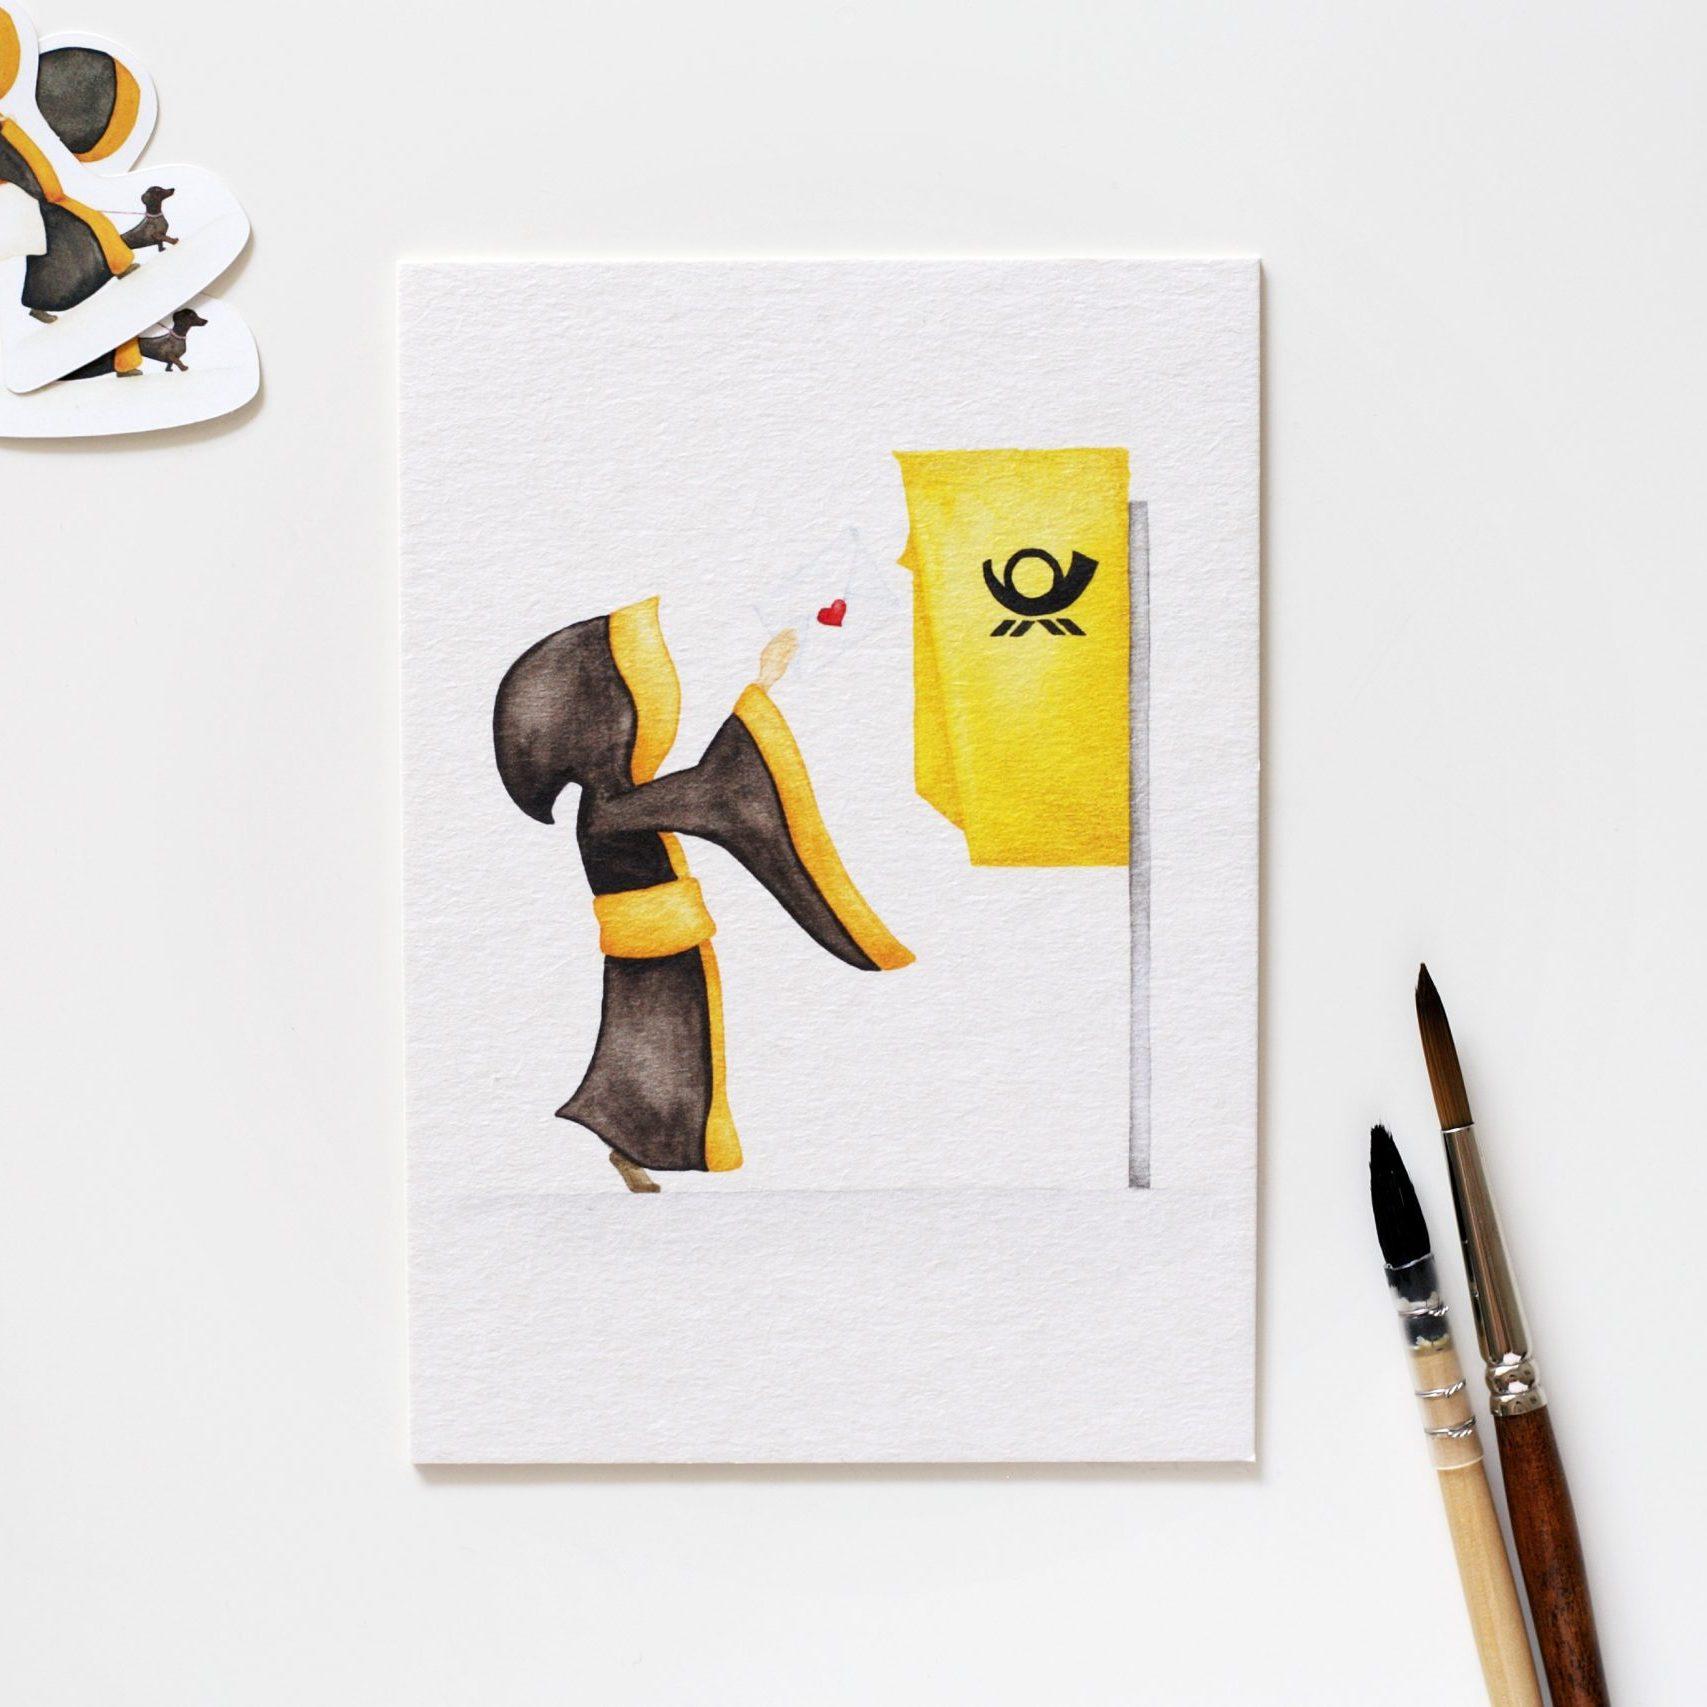 Münchner Kindl Postkarte – Liebesbrief